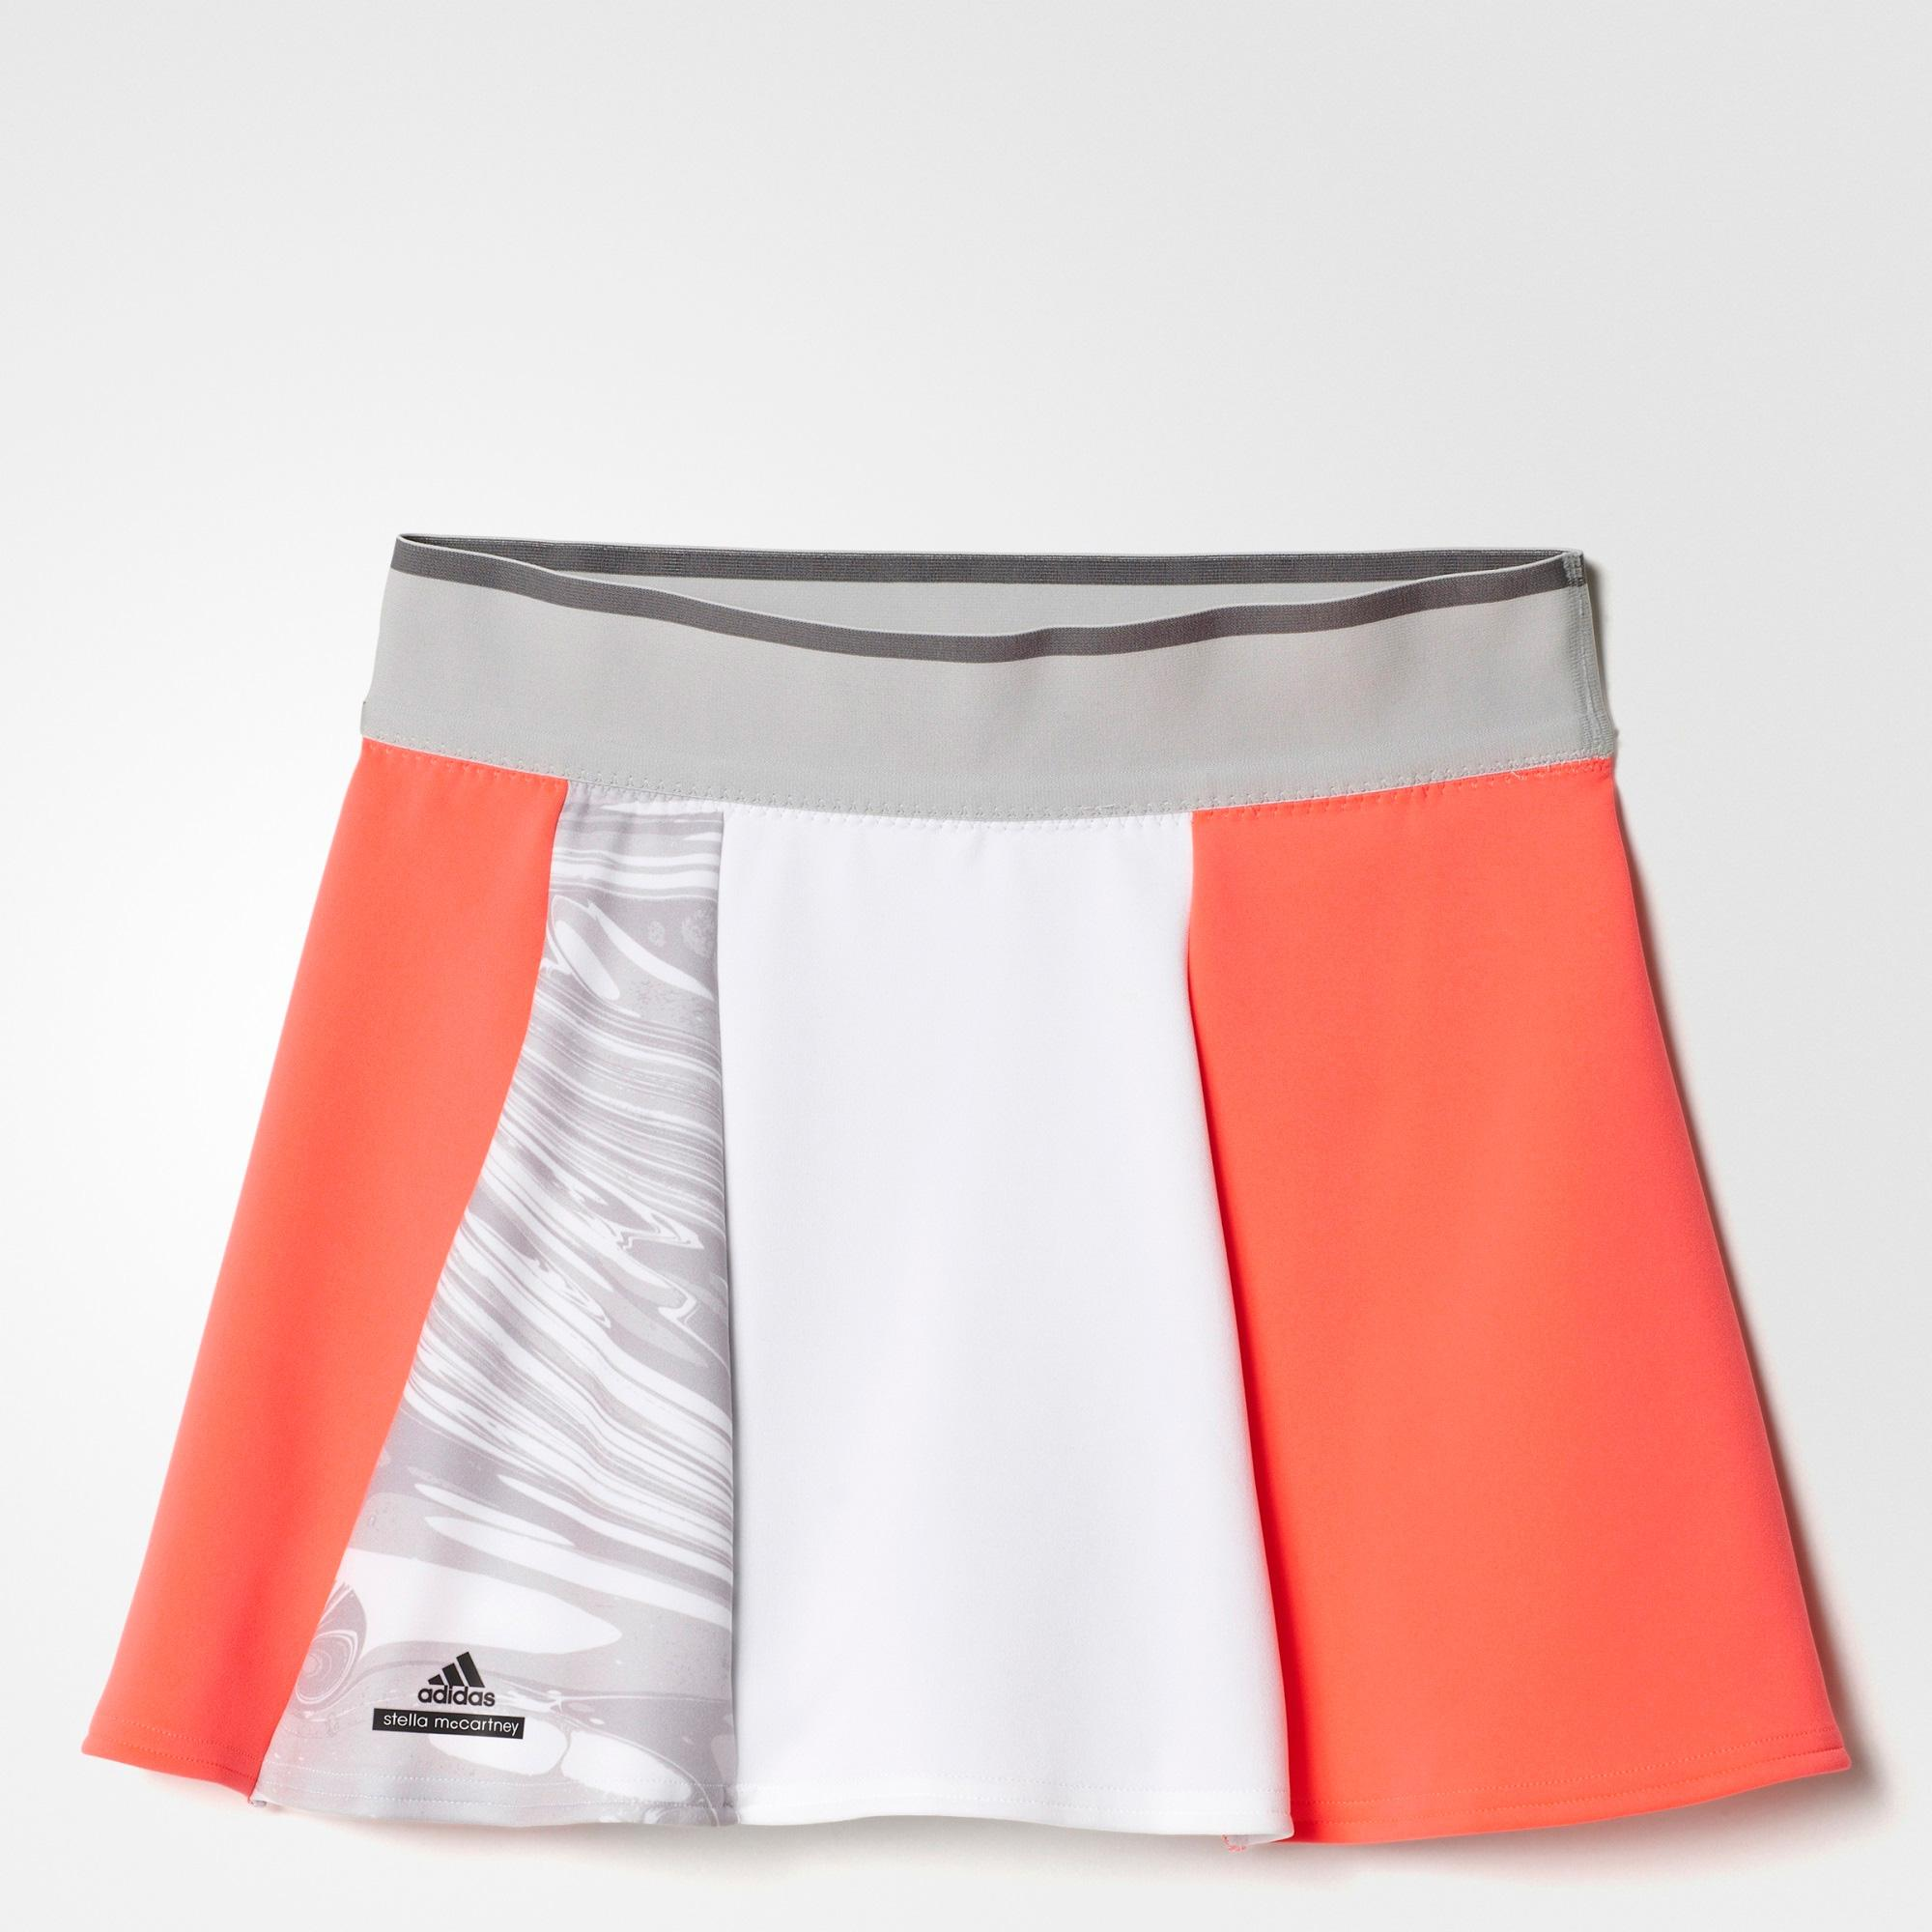 8573844ebe Adidas Girls Stella McCartney Barricade Skort - Red/White/Grey -  Tennisnuts.com